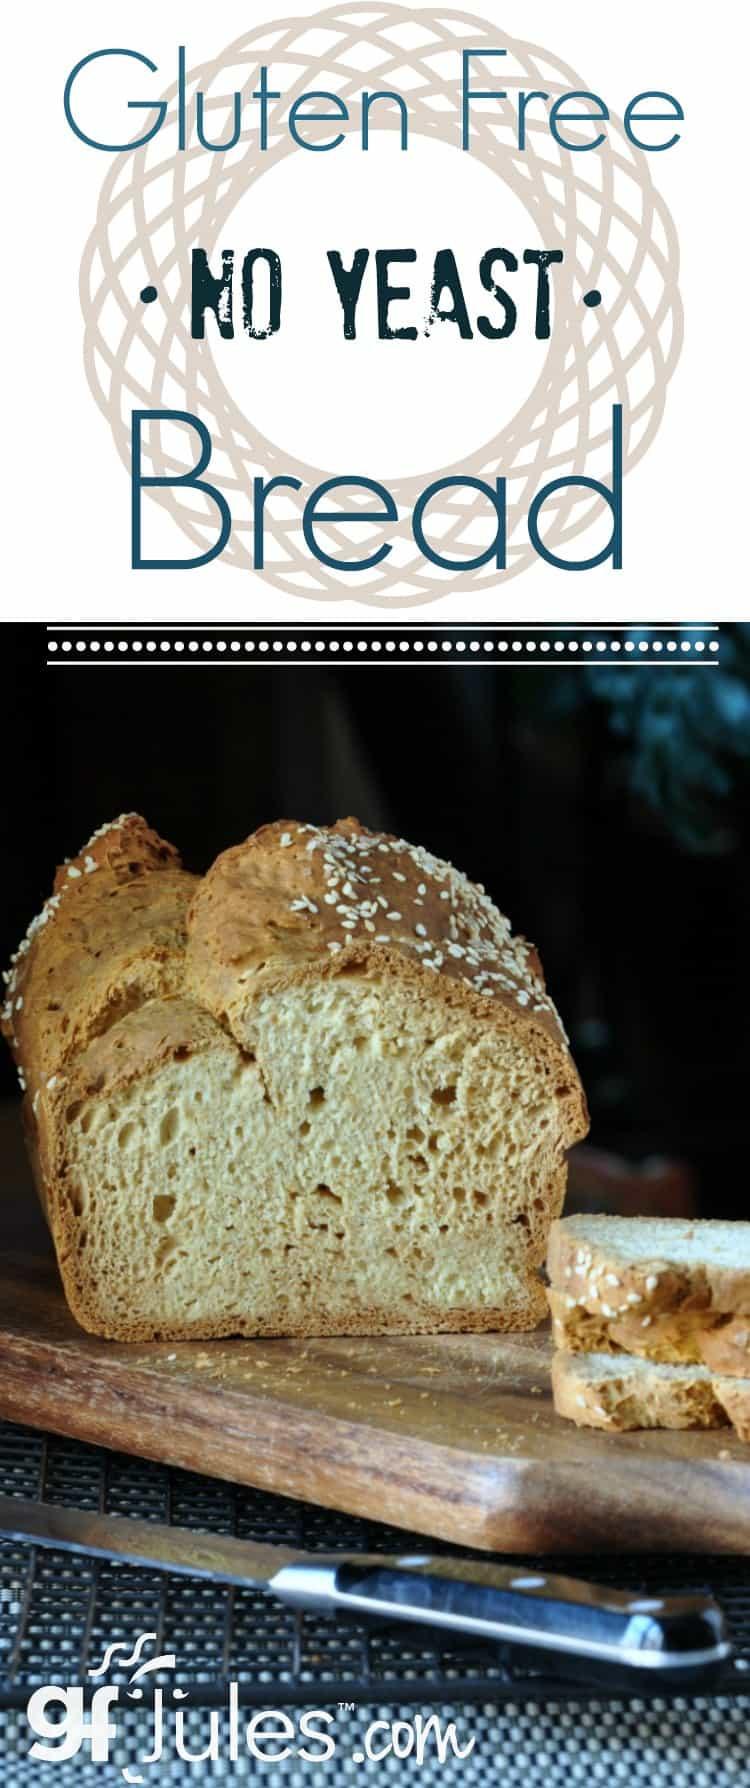 Gluten Free Bread Recipe With Yeast  Gluten Free No Yeast Bread Recipe for Sandwiches gfJules